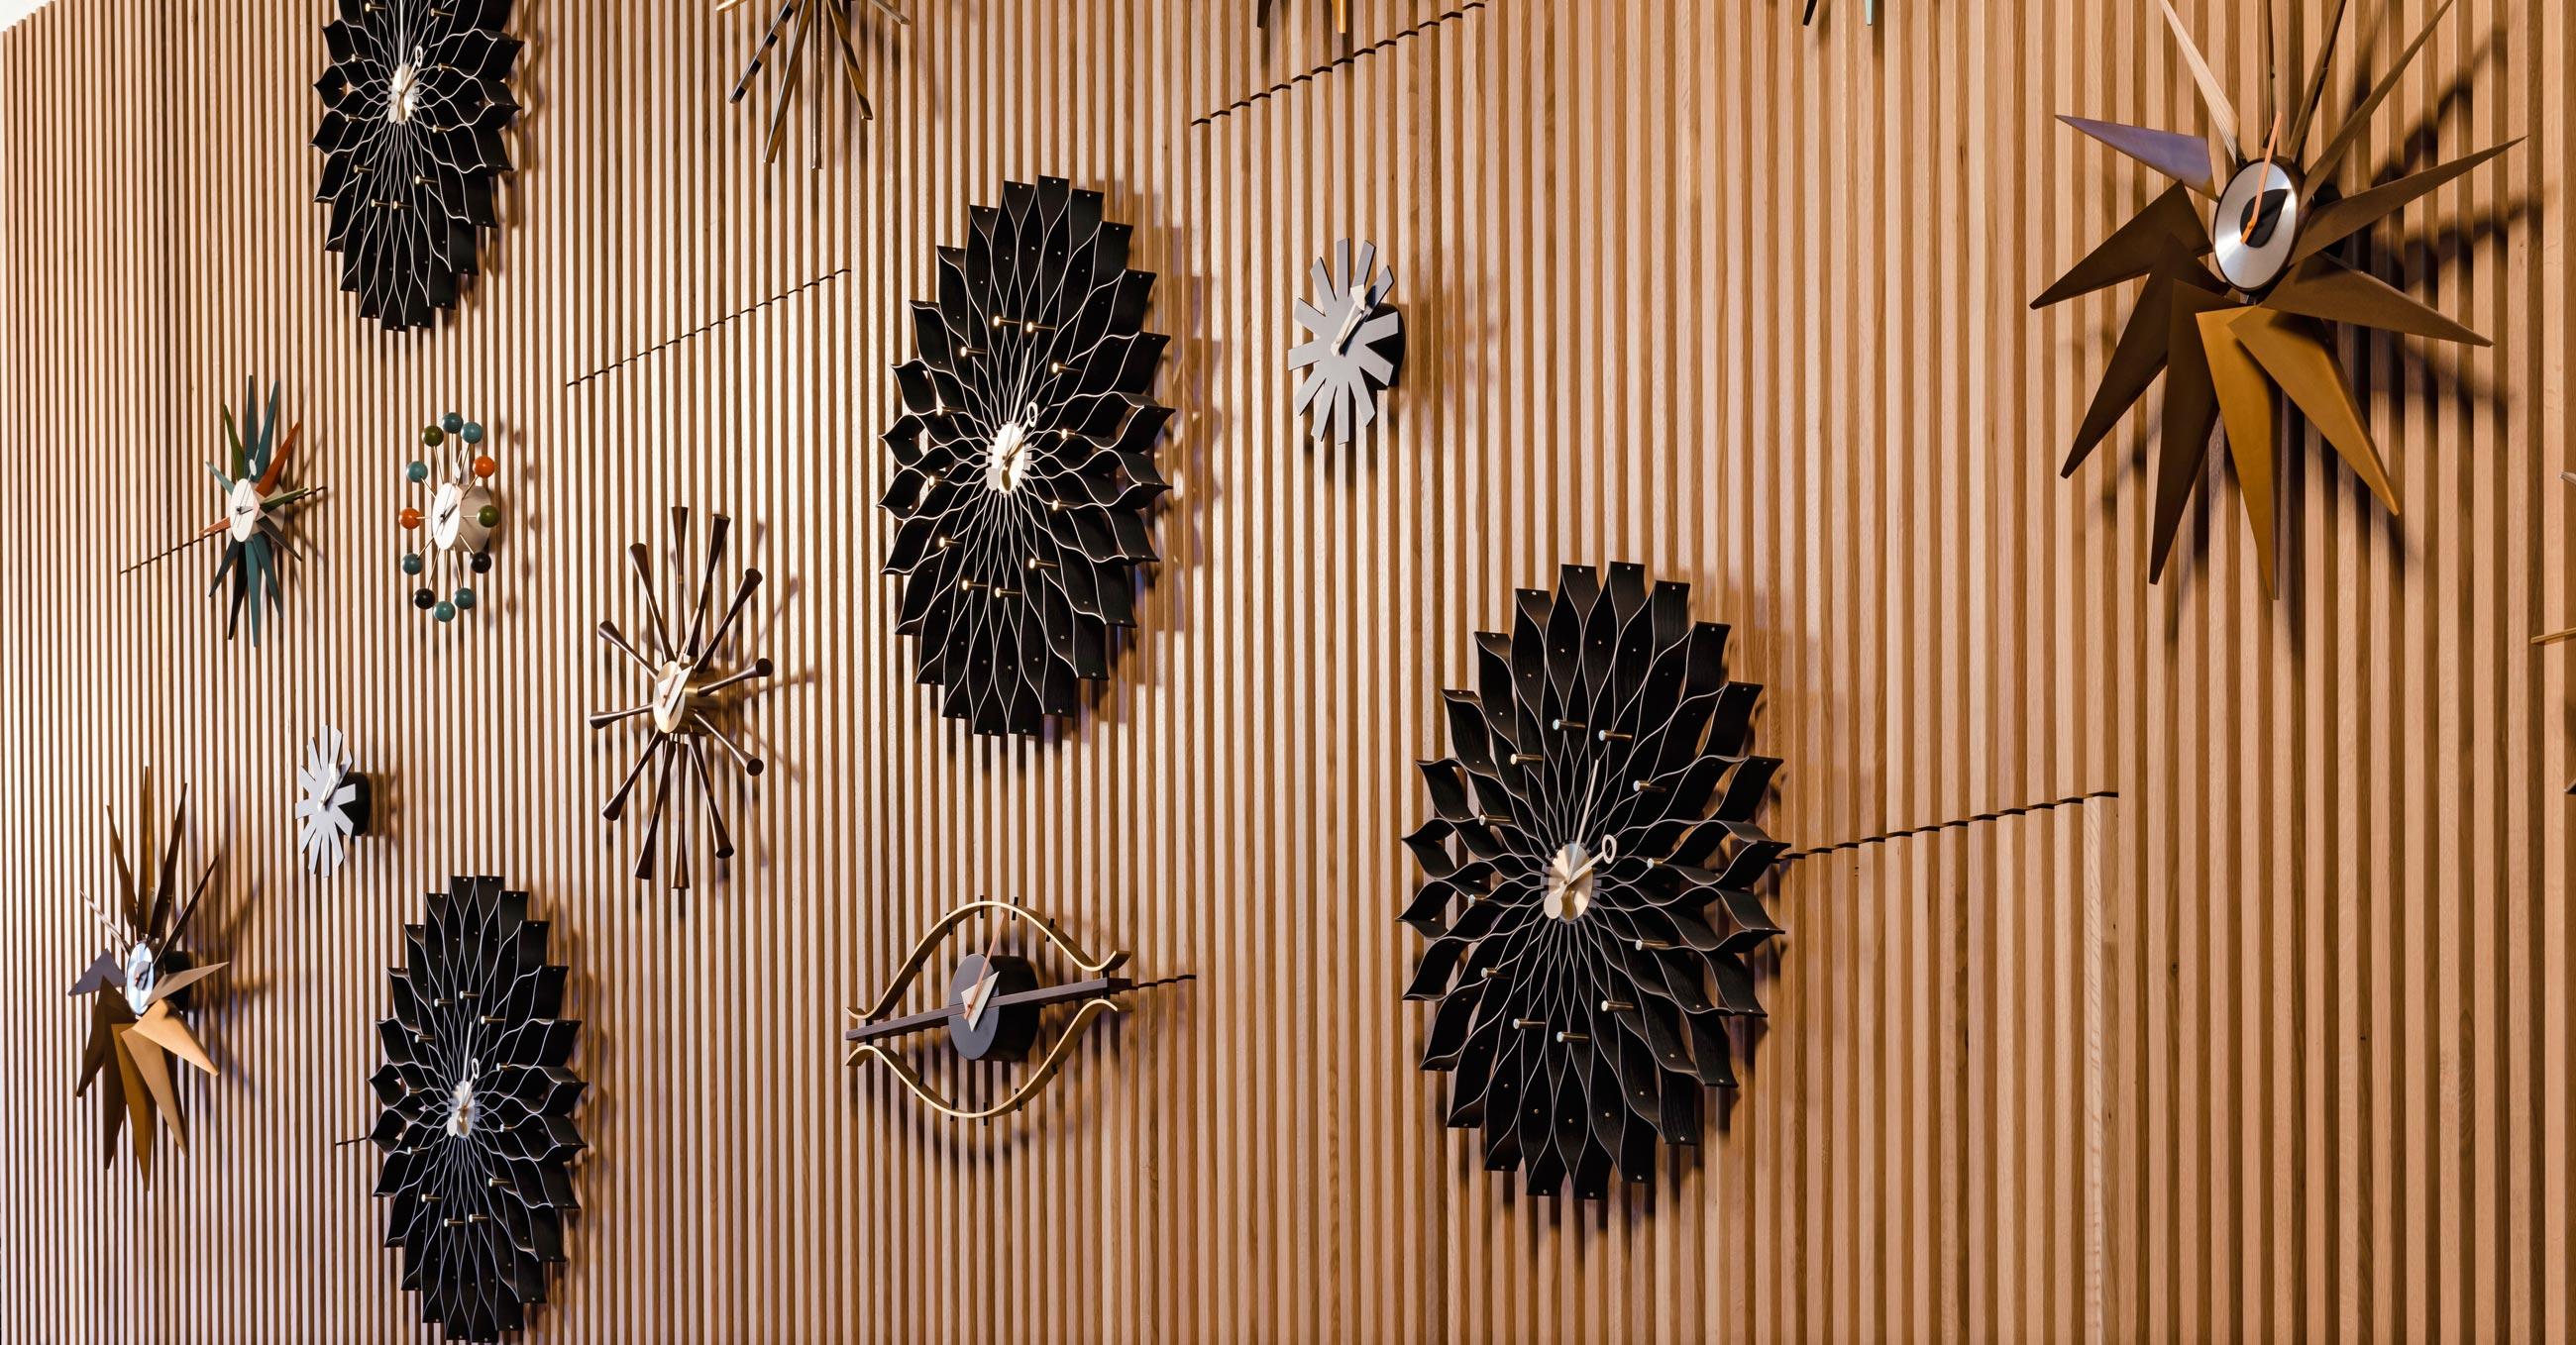 Vitra Wall Clocks - Sunflower Turbine Sunburst Eye Asterisk Ball Clock Spindle